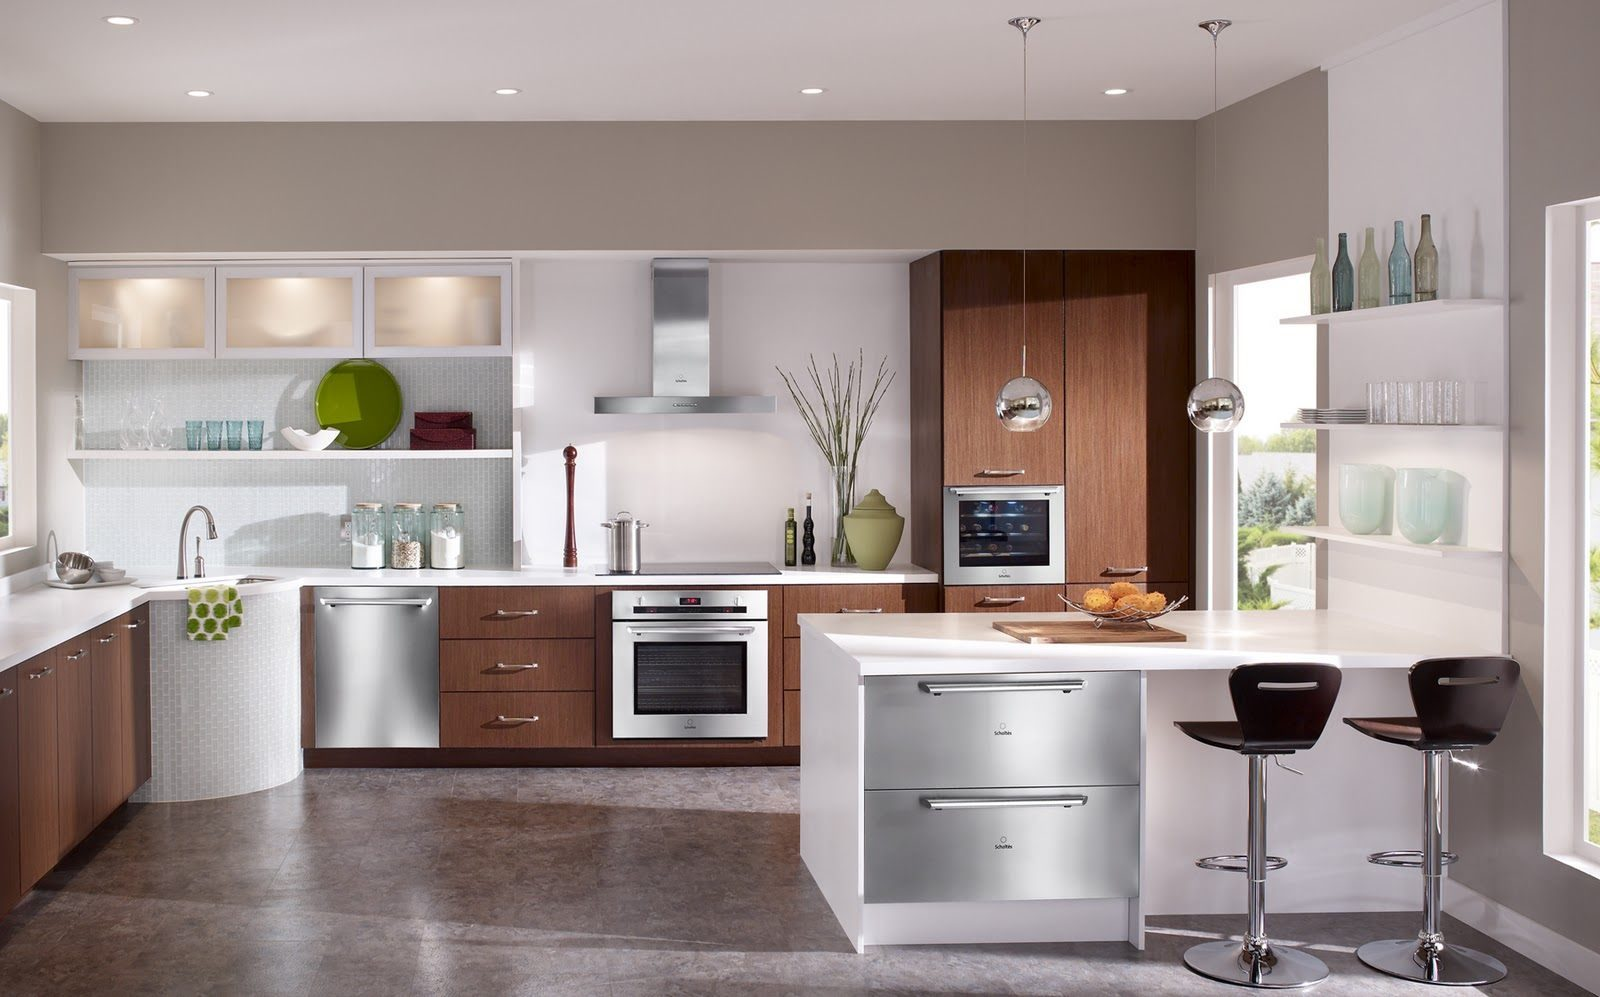 Escoger electrodom sticos de cocina for Estilos de cocinas integrales modernas